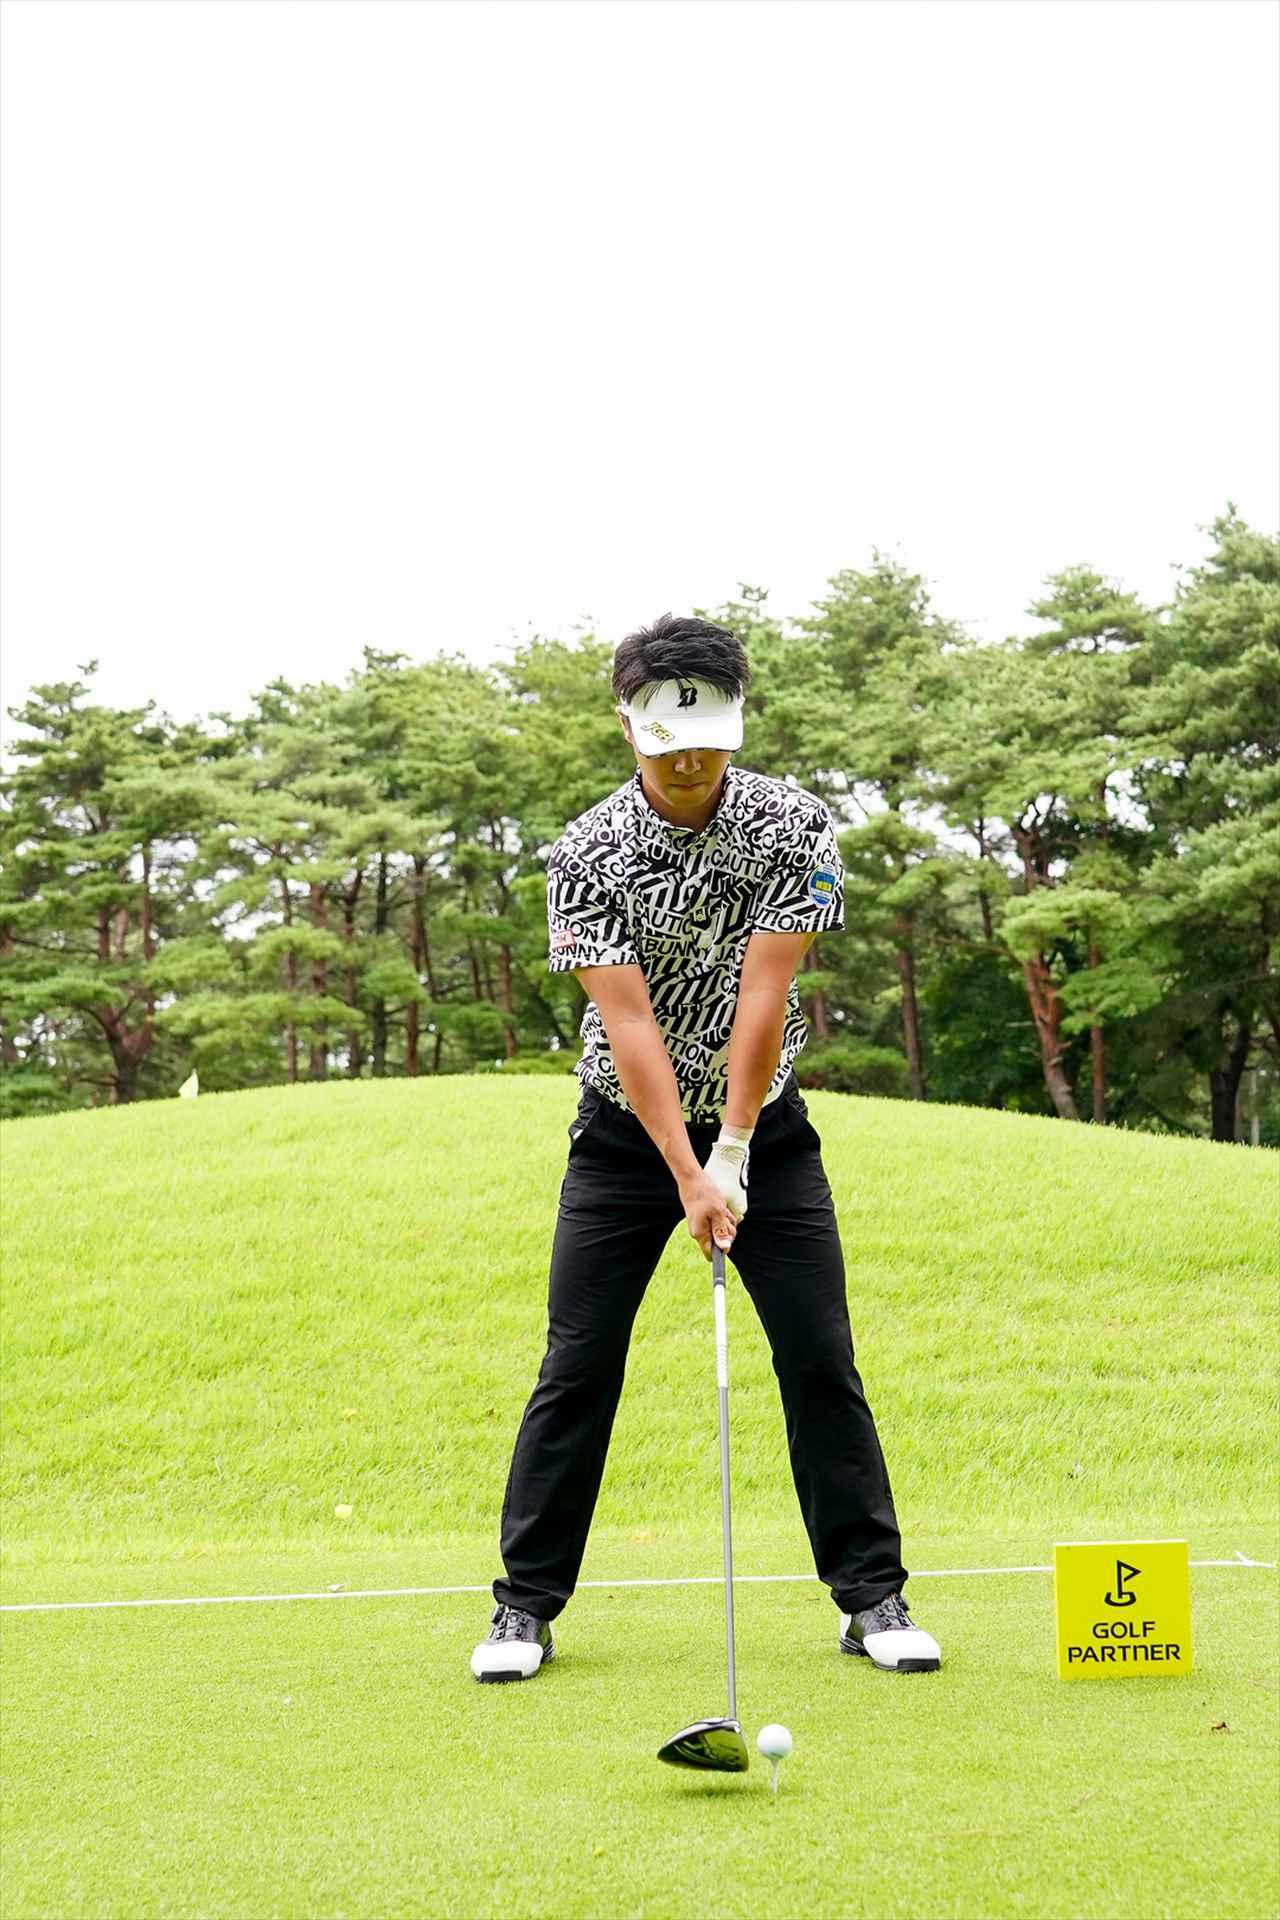 Images : 1番目の画像 - 関藤直煕 ドライバー正面連続写真 - みんなのゴルフダイジェスト